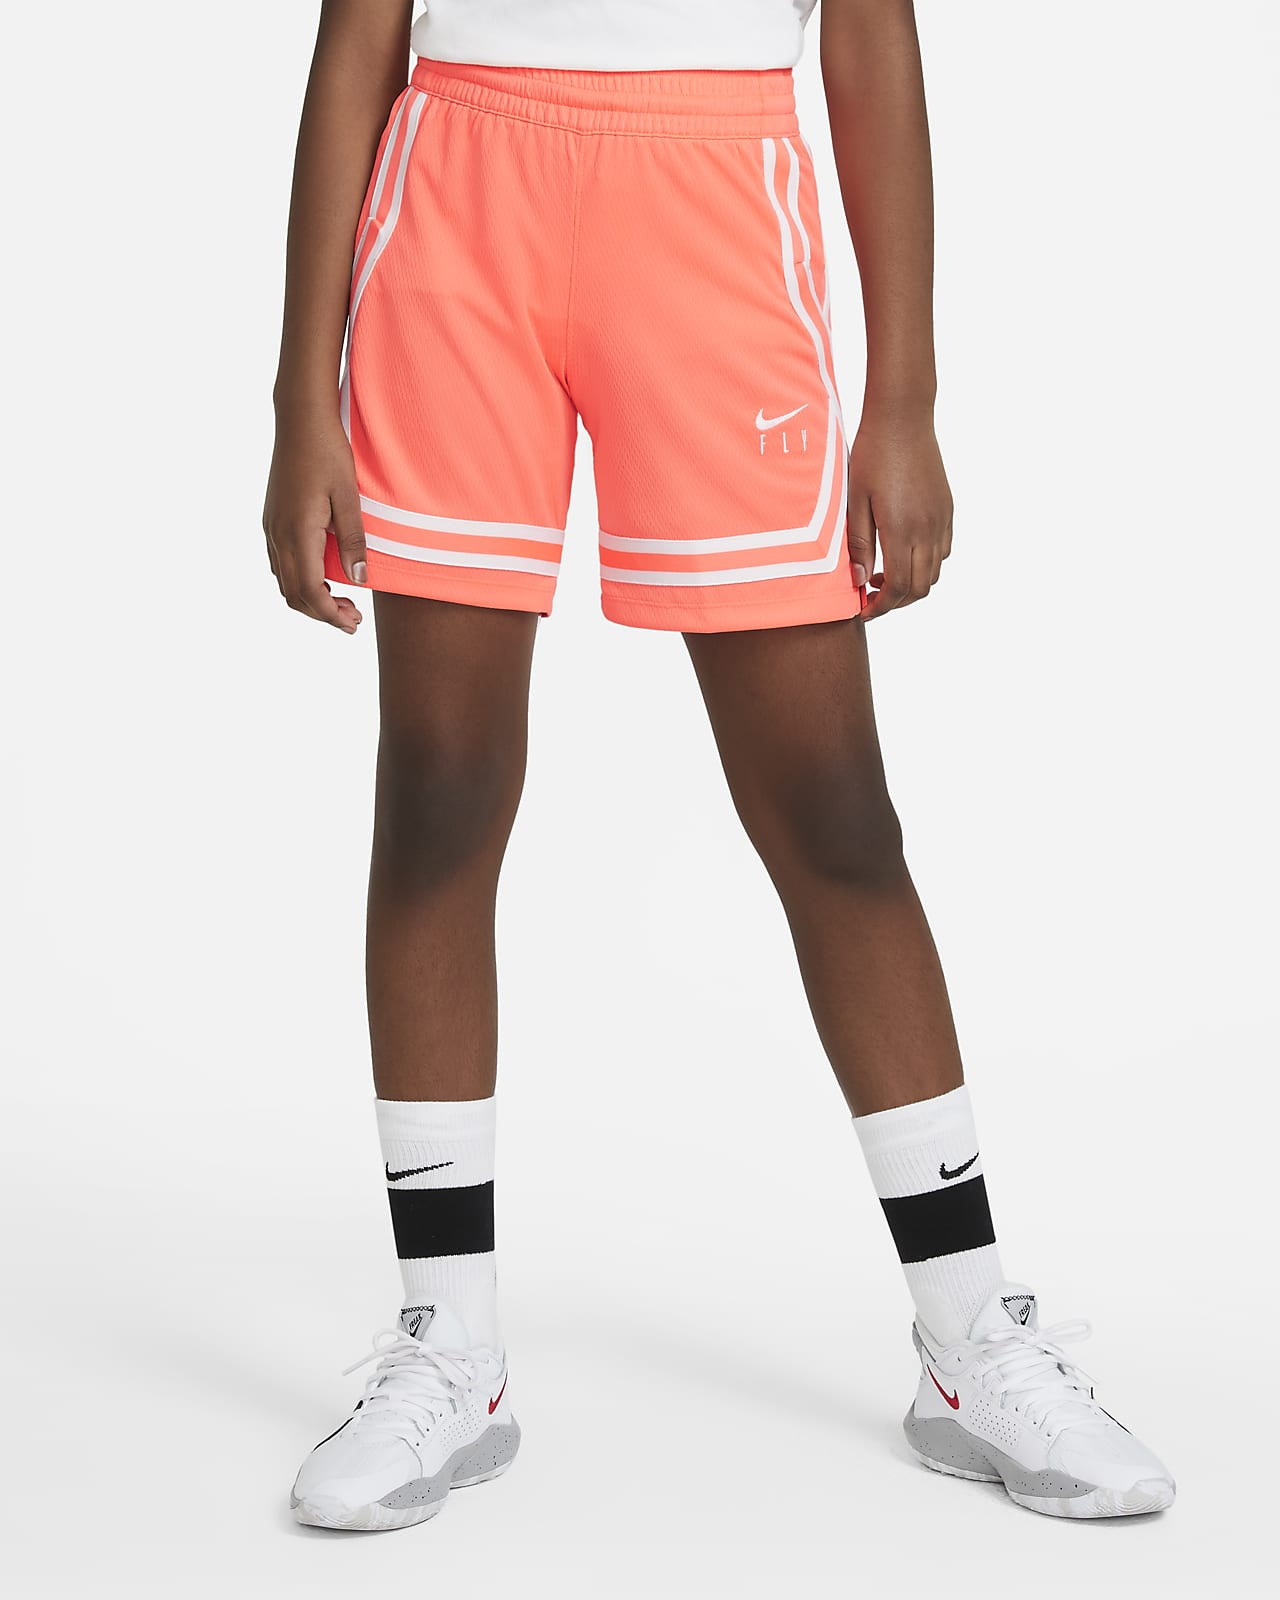 Nike Fly Crossover Big Kids' (Girls') Training Shorts